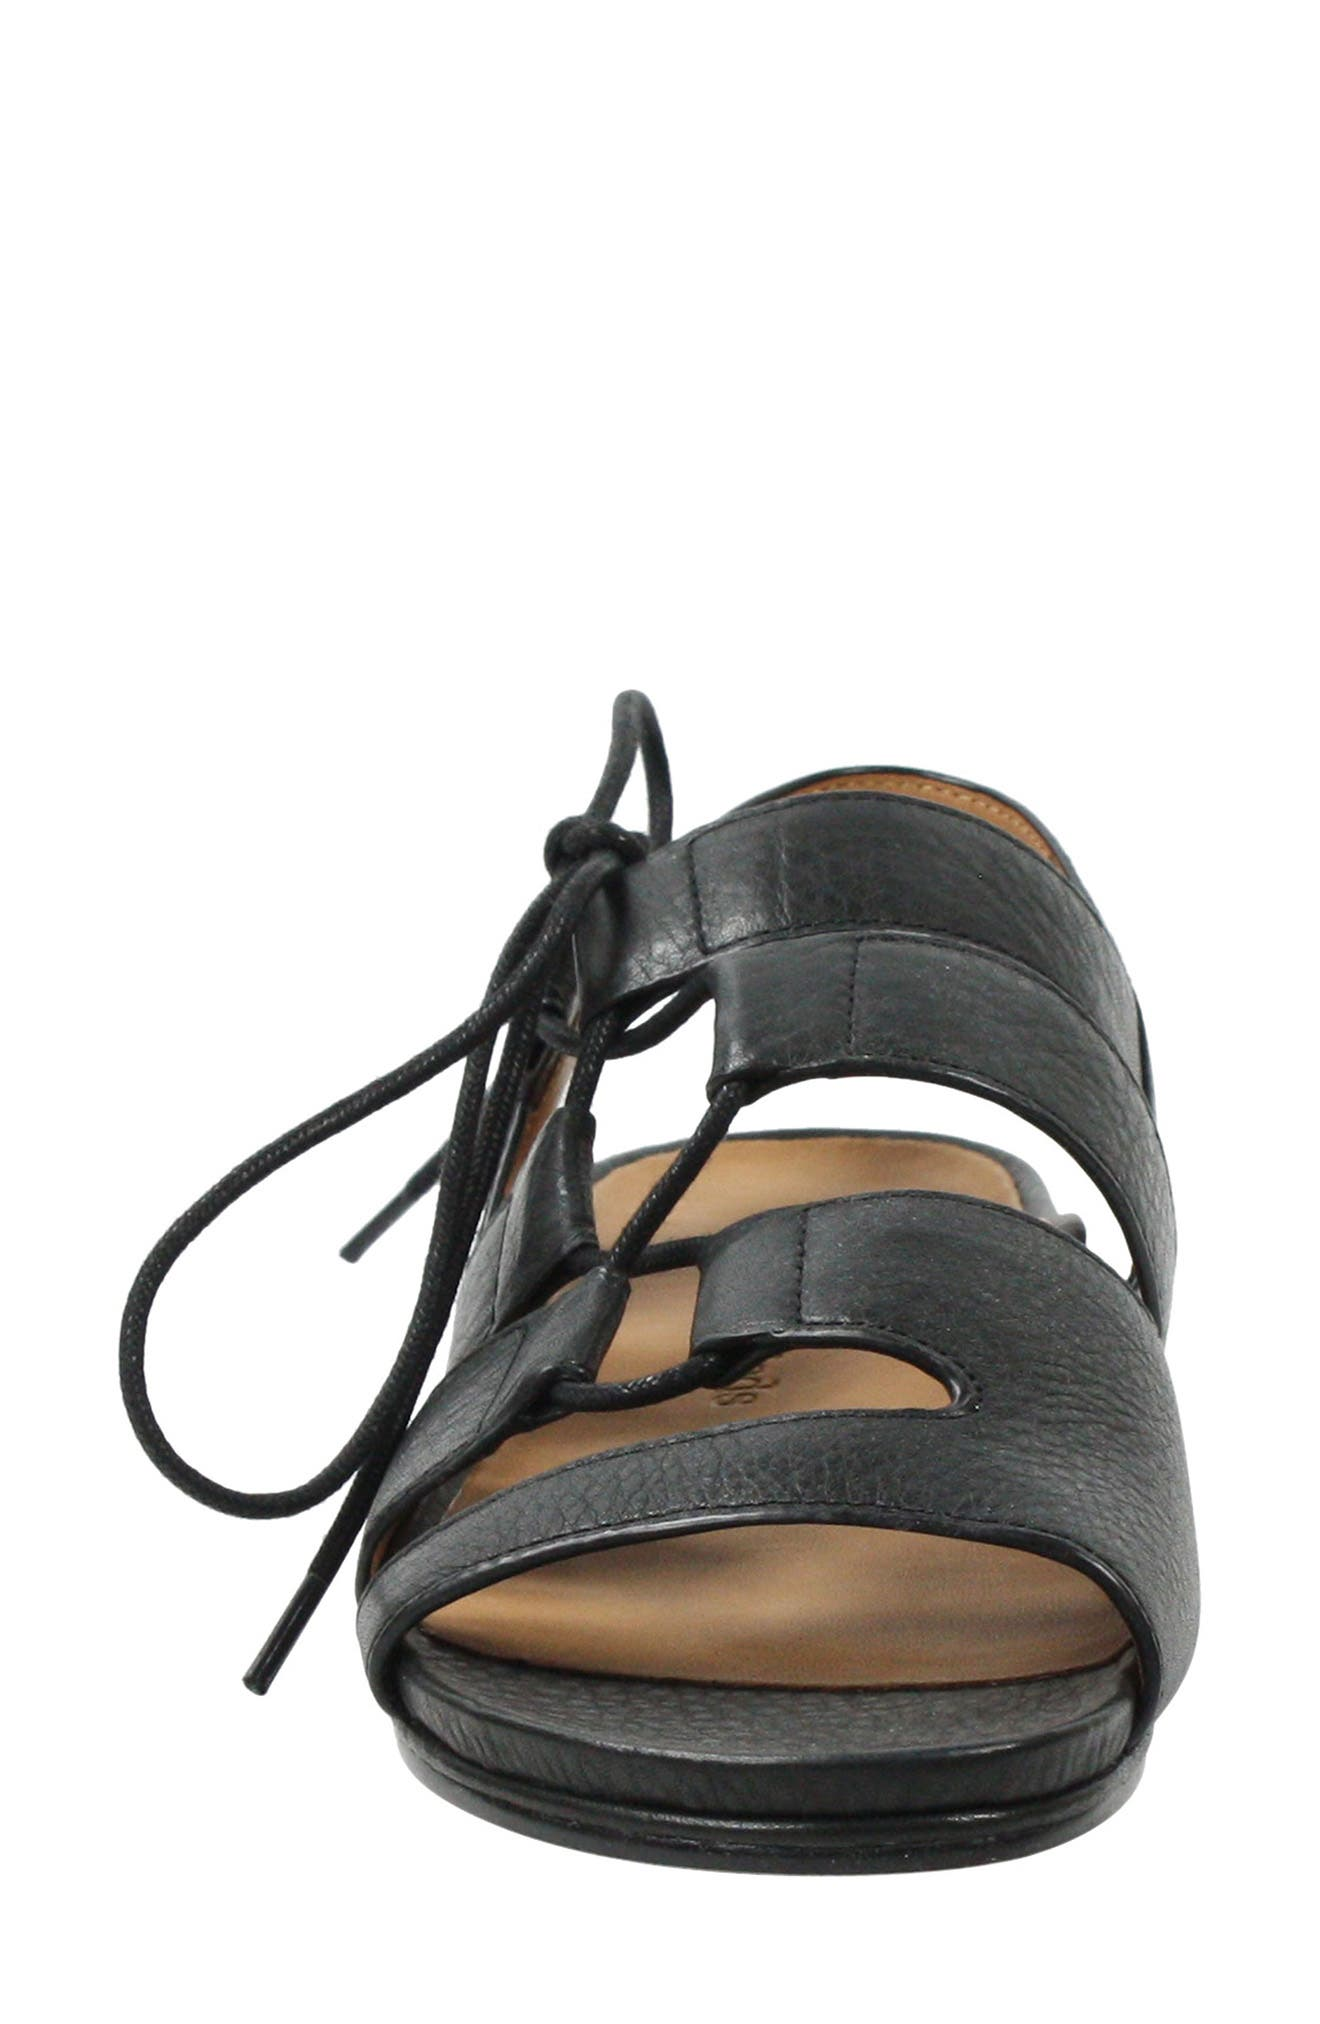 Digbee Sandal,                             Alternate thumbnail 4, color,                             BLACK LEATHER